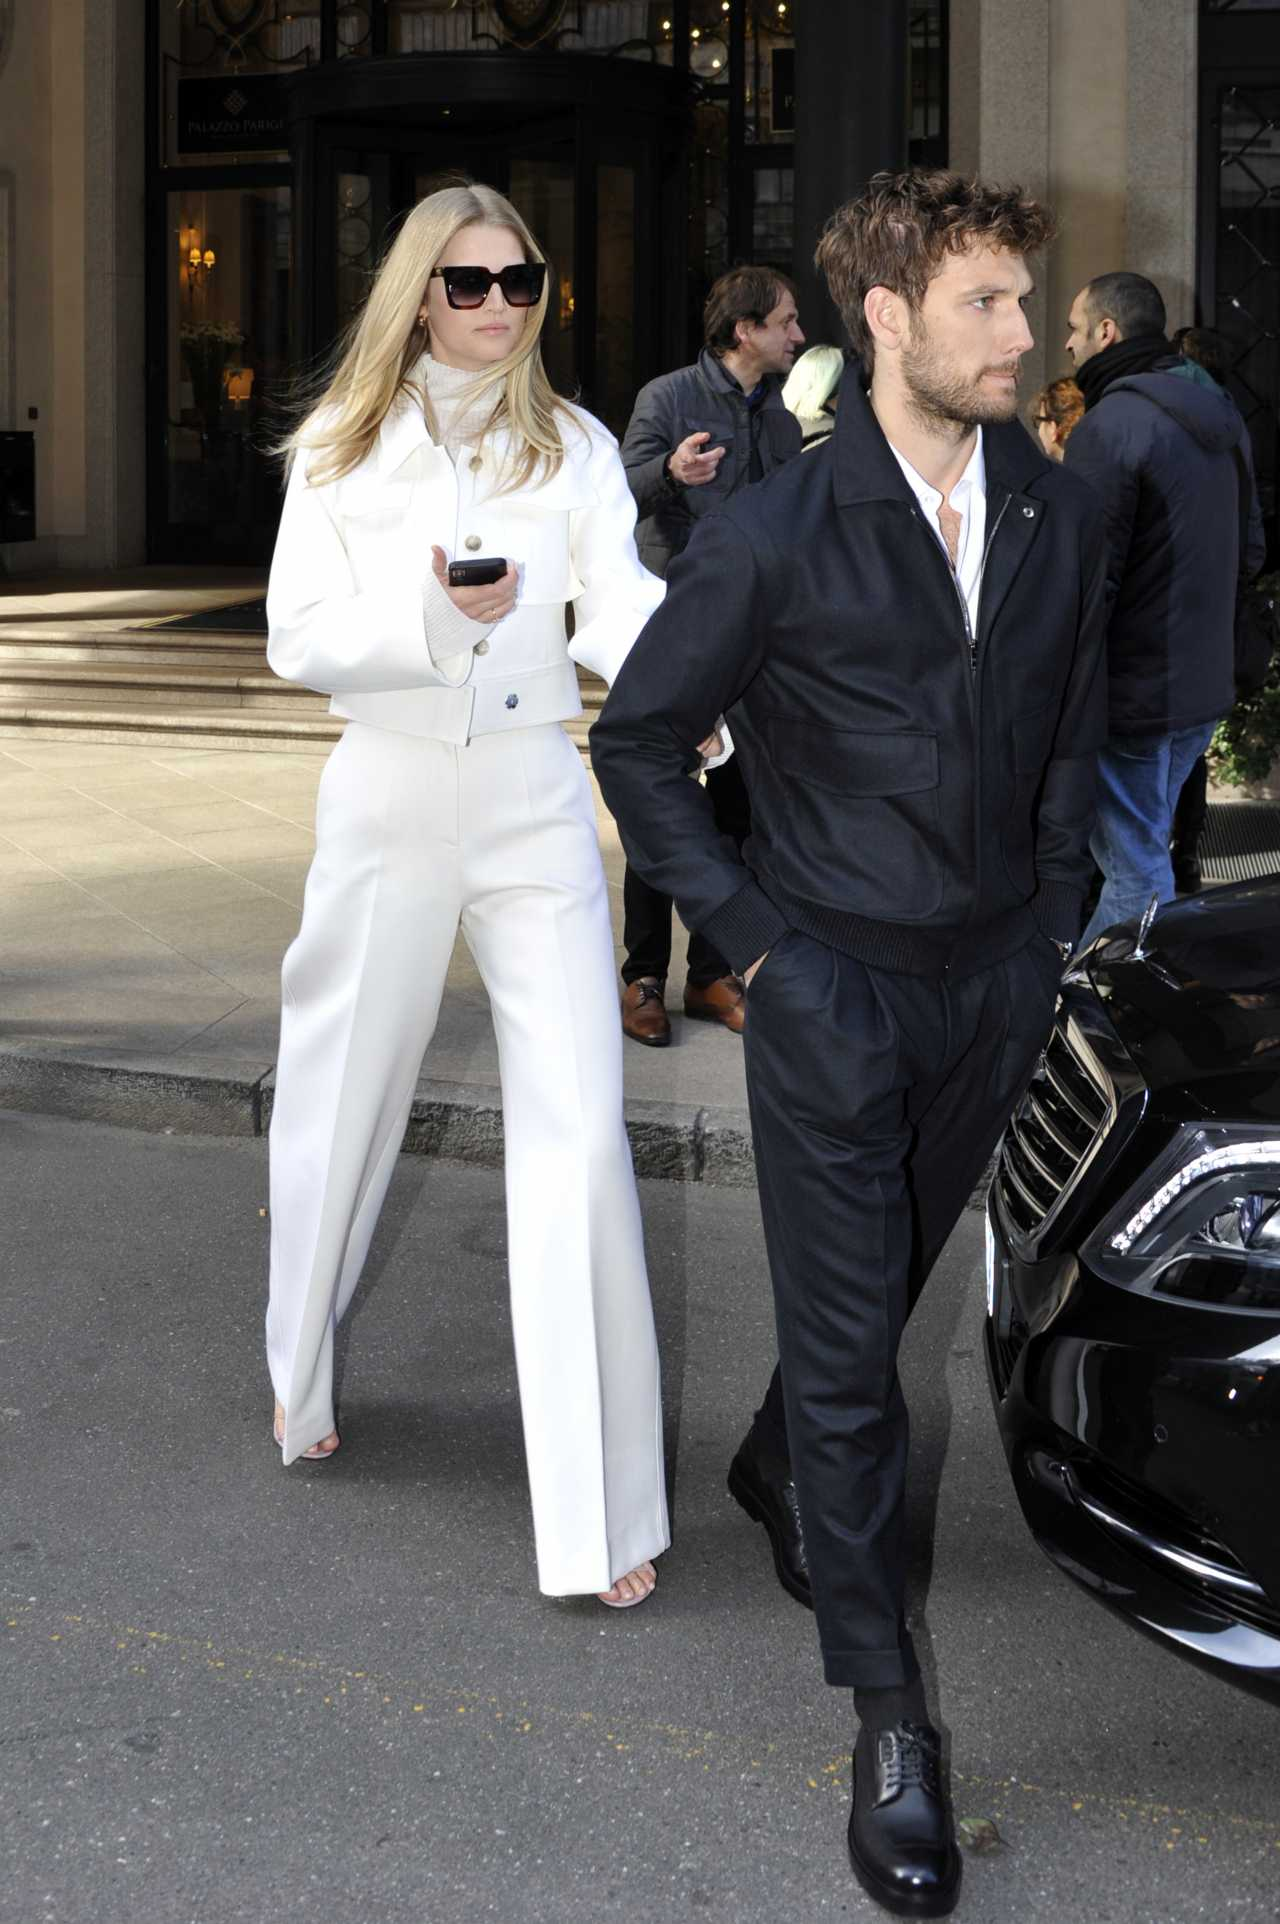 Toni Garrn 2020 : Toni Garrn with Alex Pettyfer – Candids at Hotel in Milan-04